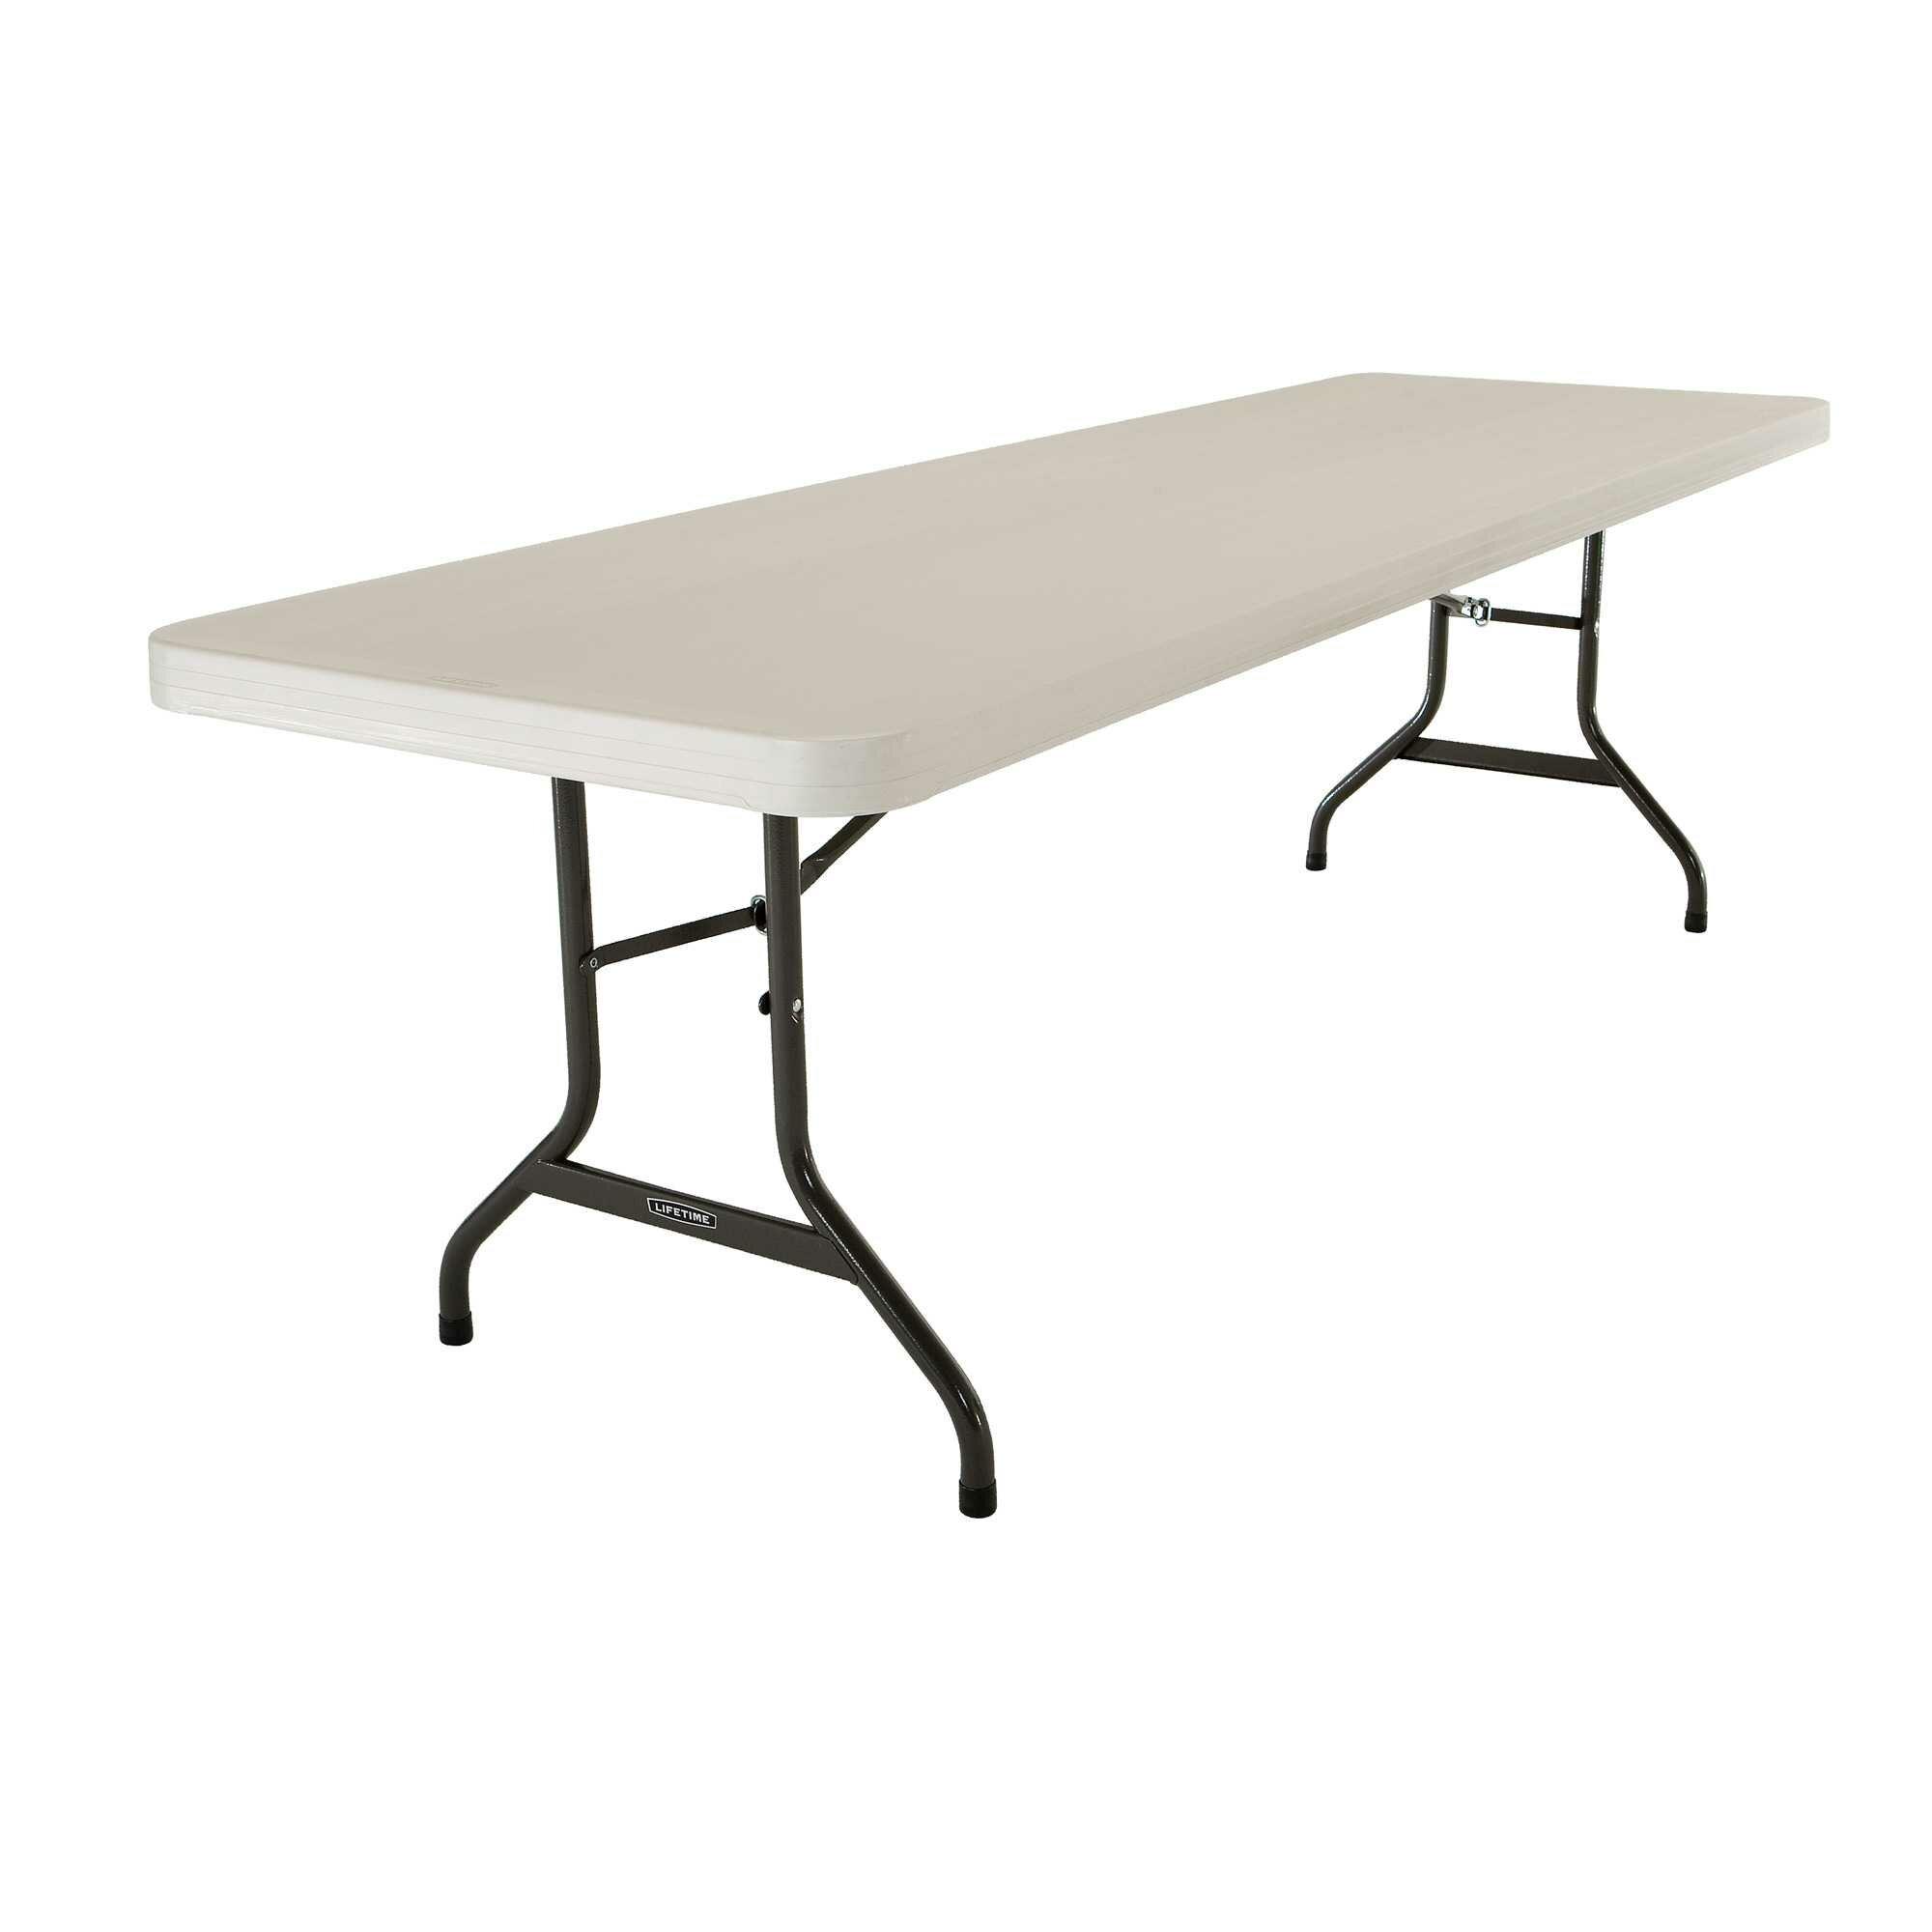 Lifetime Folding Table picture on Lifetime 96 Rectangular Folding Table 2980 LXT1277 with Lifetime Folding Table, Folding Table 8a92bb4861888403f0f2569042555ebe